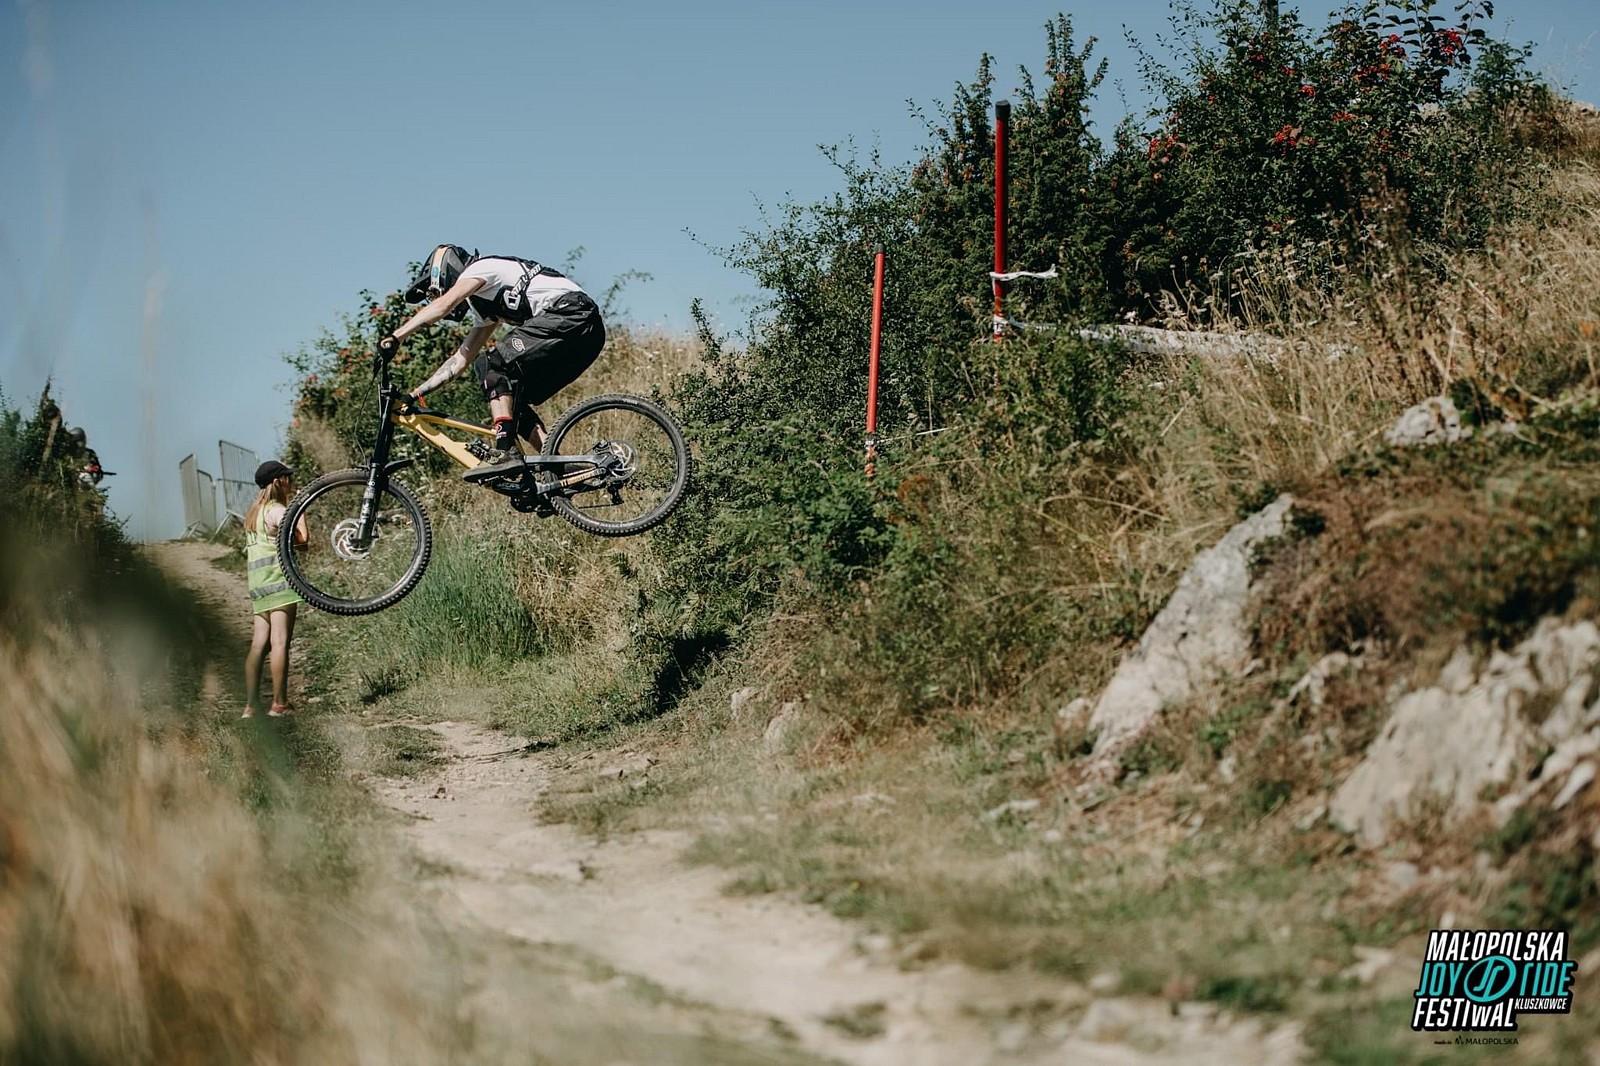 Małopolska Joy Ride Festiwal 2020 - bartek_zgr - Mountain Biking Pictures - Vital MTB